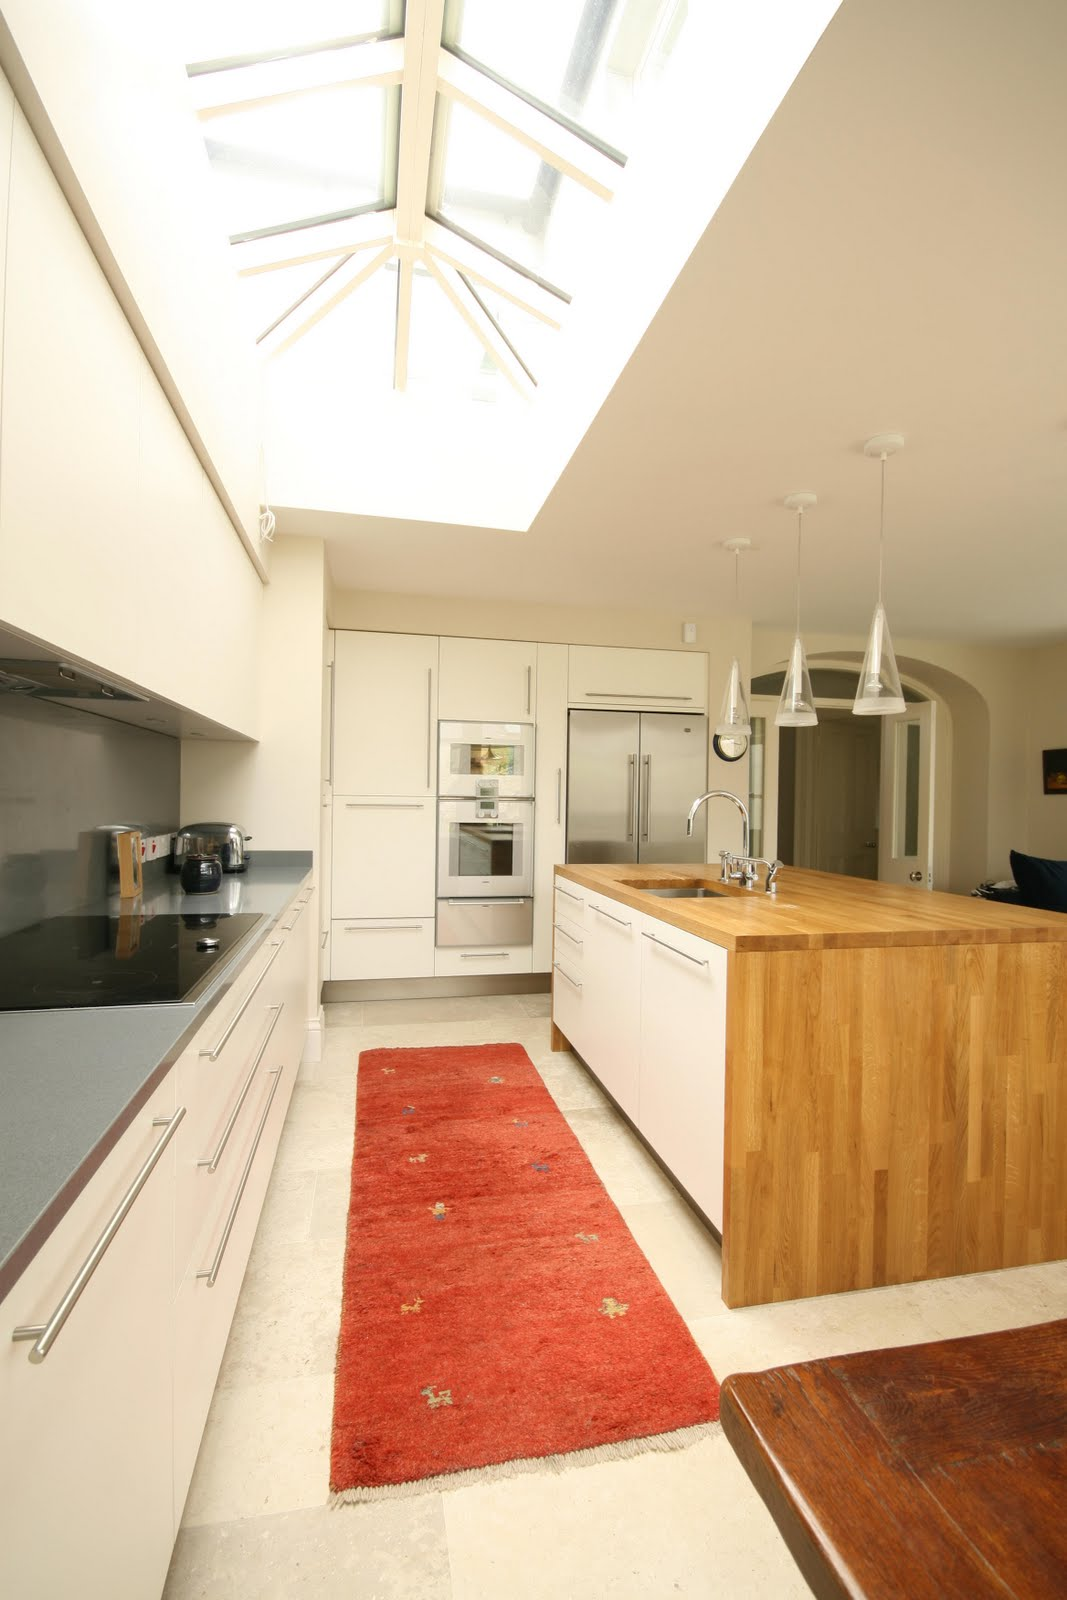 Kitchen, Wardrobes and Bespoke furniture: Sandycove Renovation on